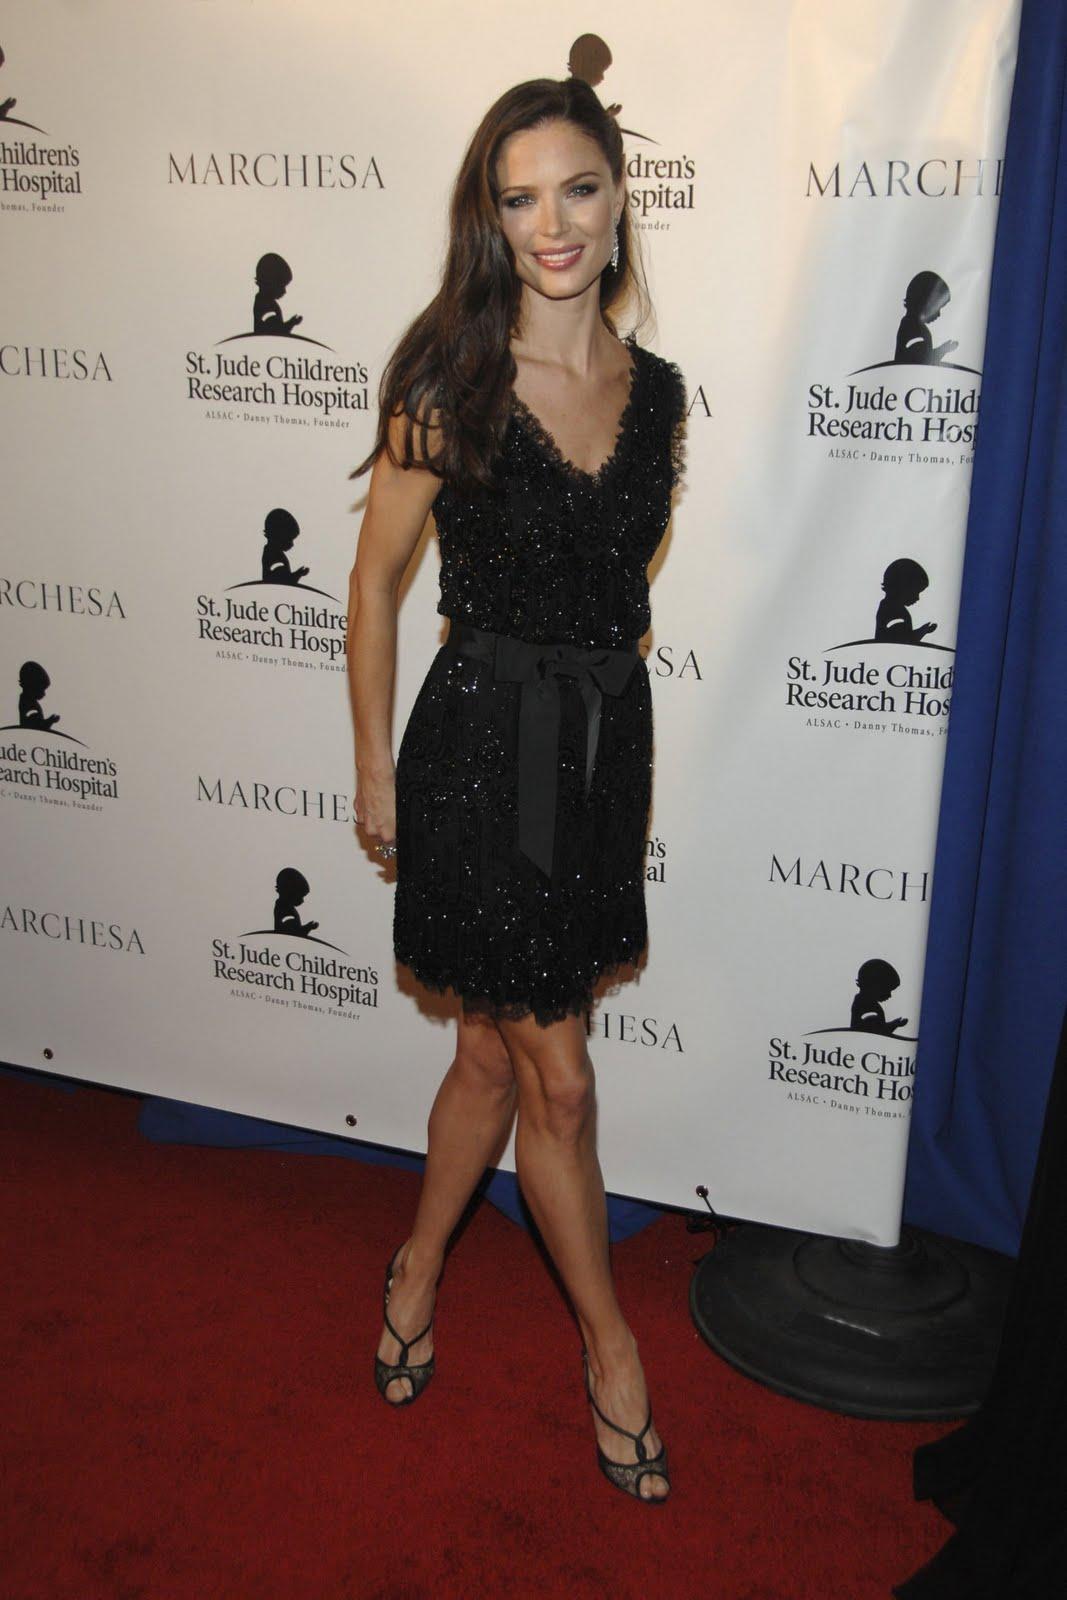 Georgina Chapman Is A Delightful English Fashion Designer And Actress